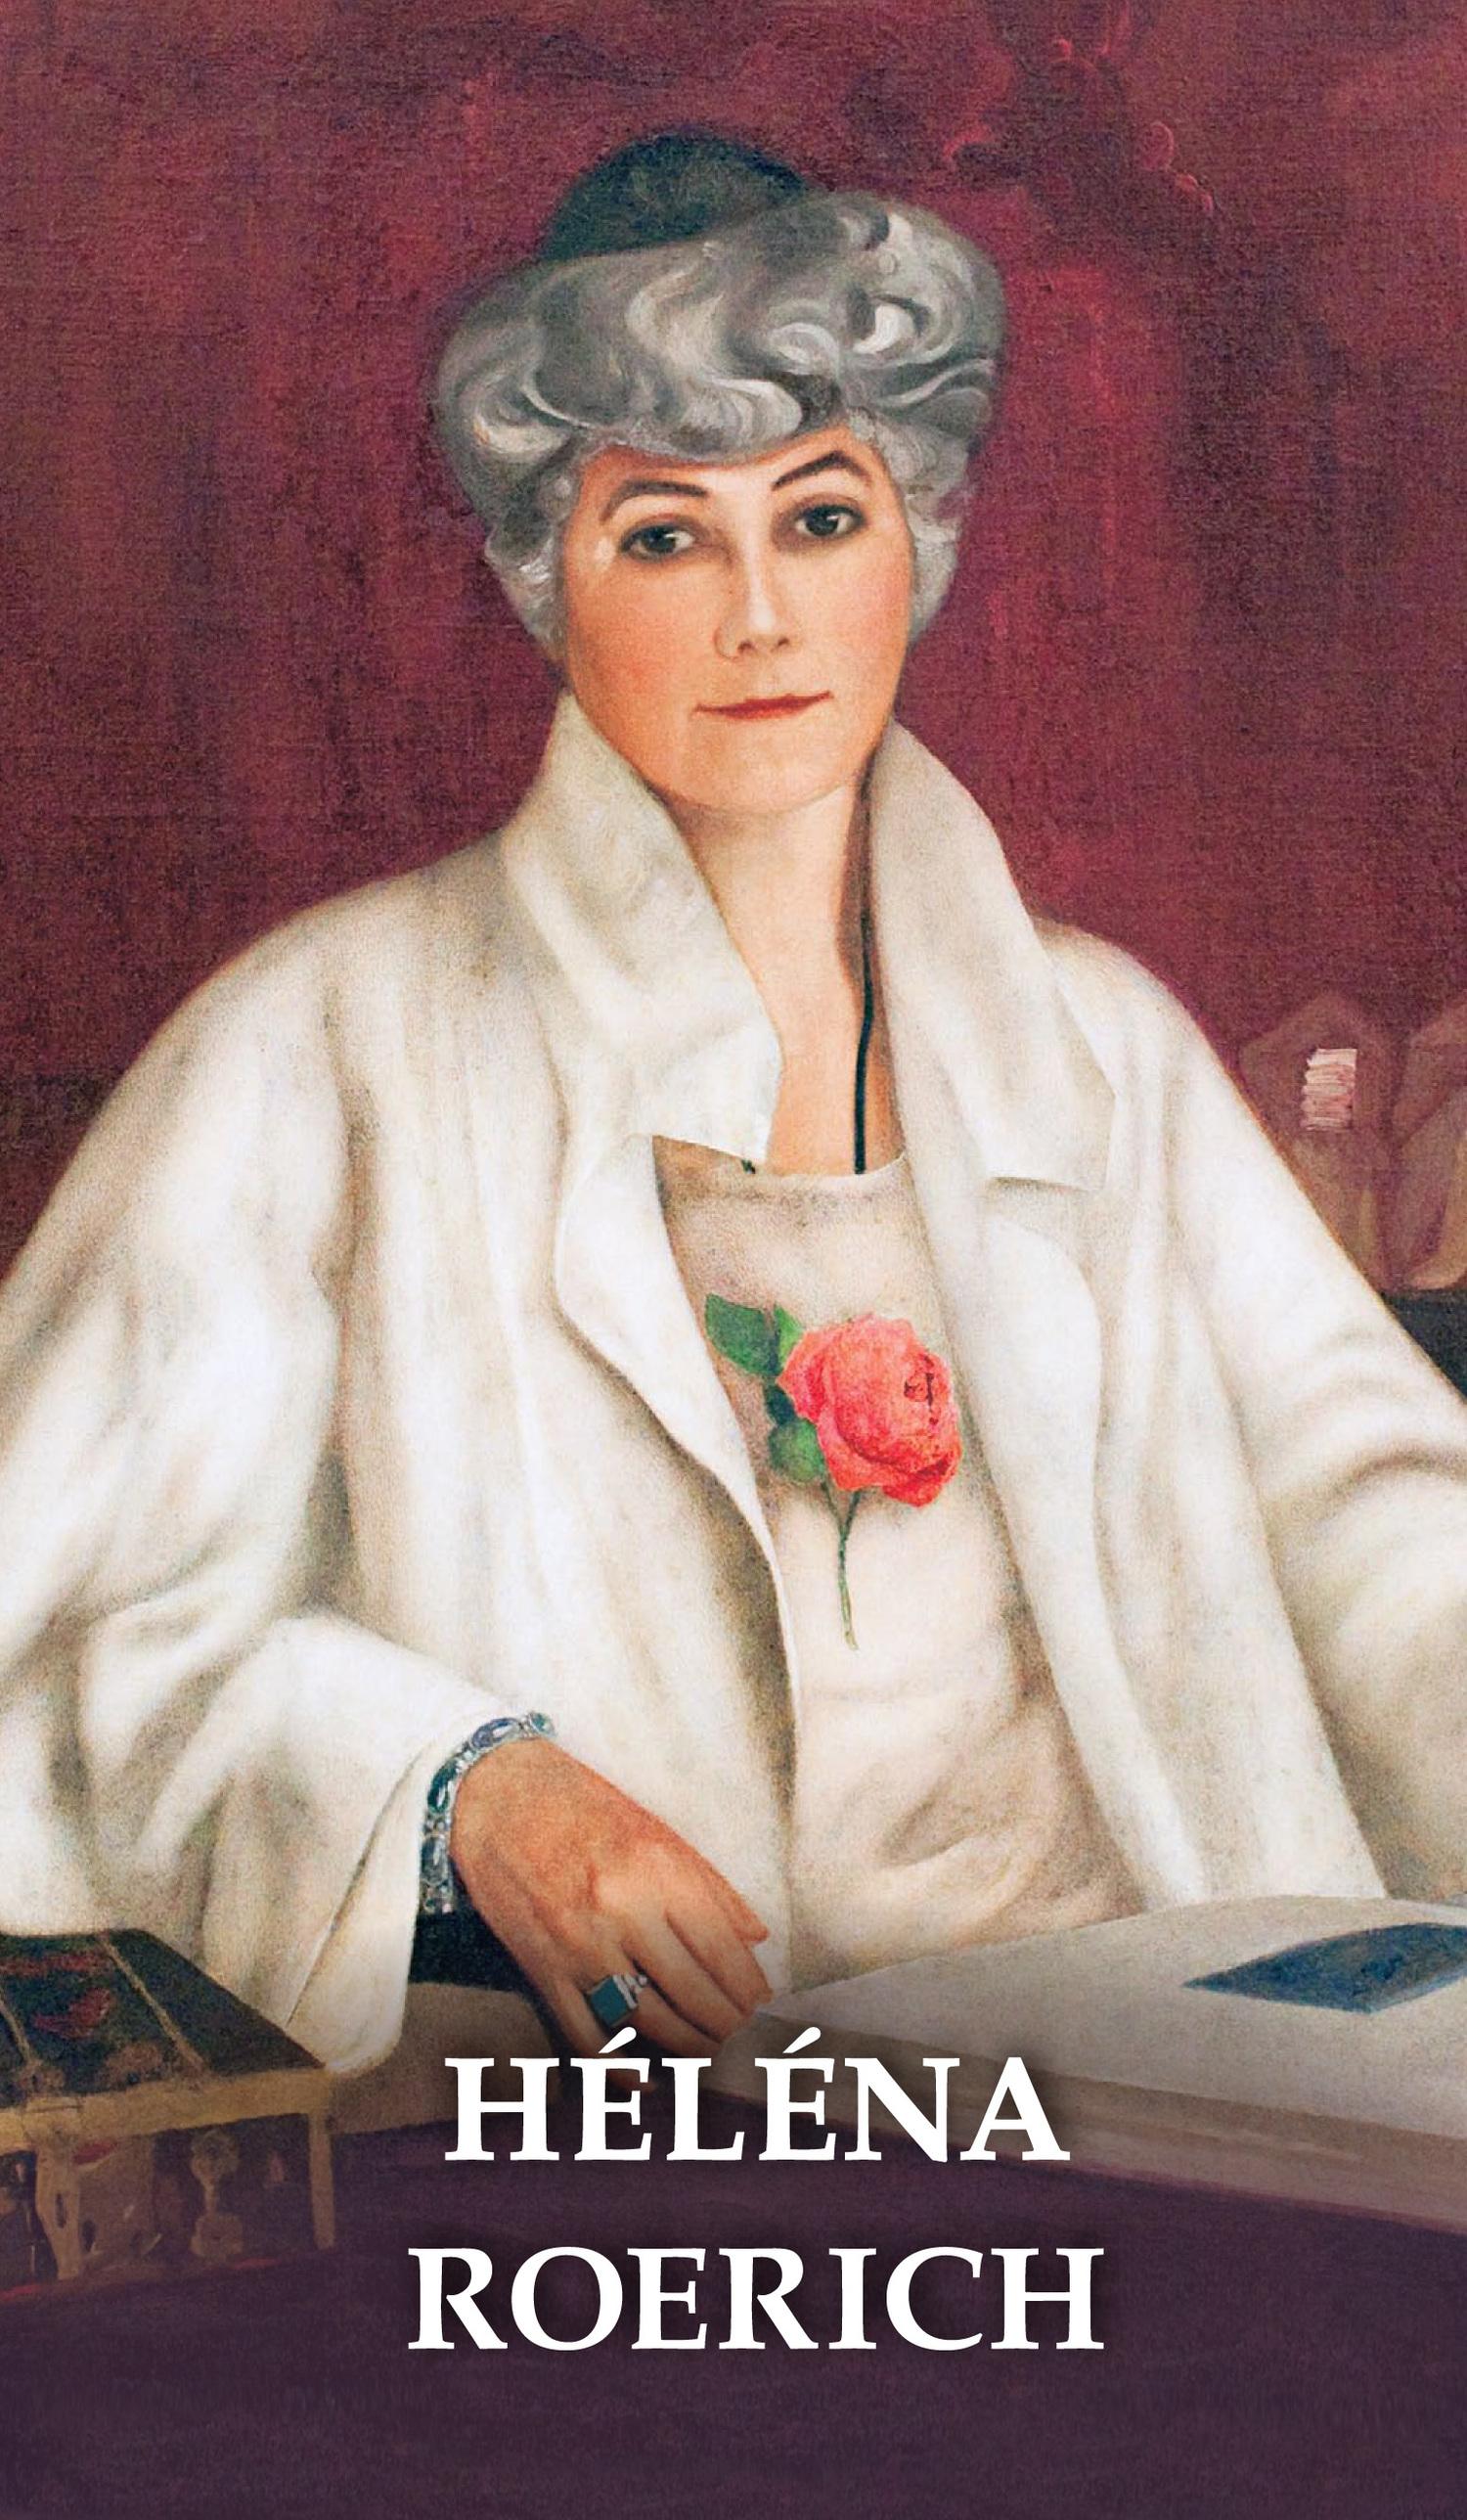 Т. О. Книжник. Héléna Roerich